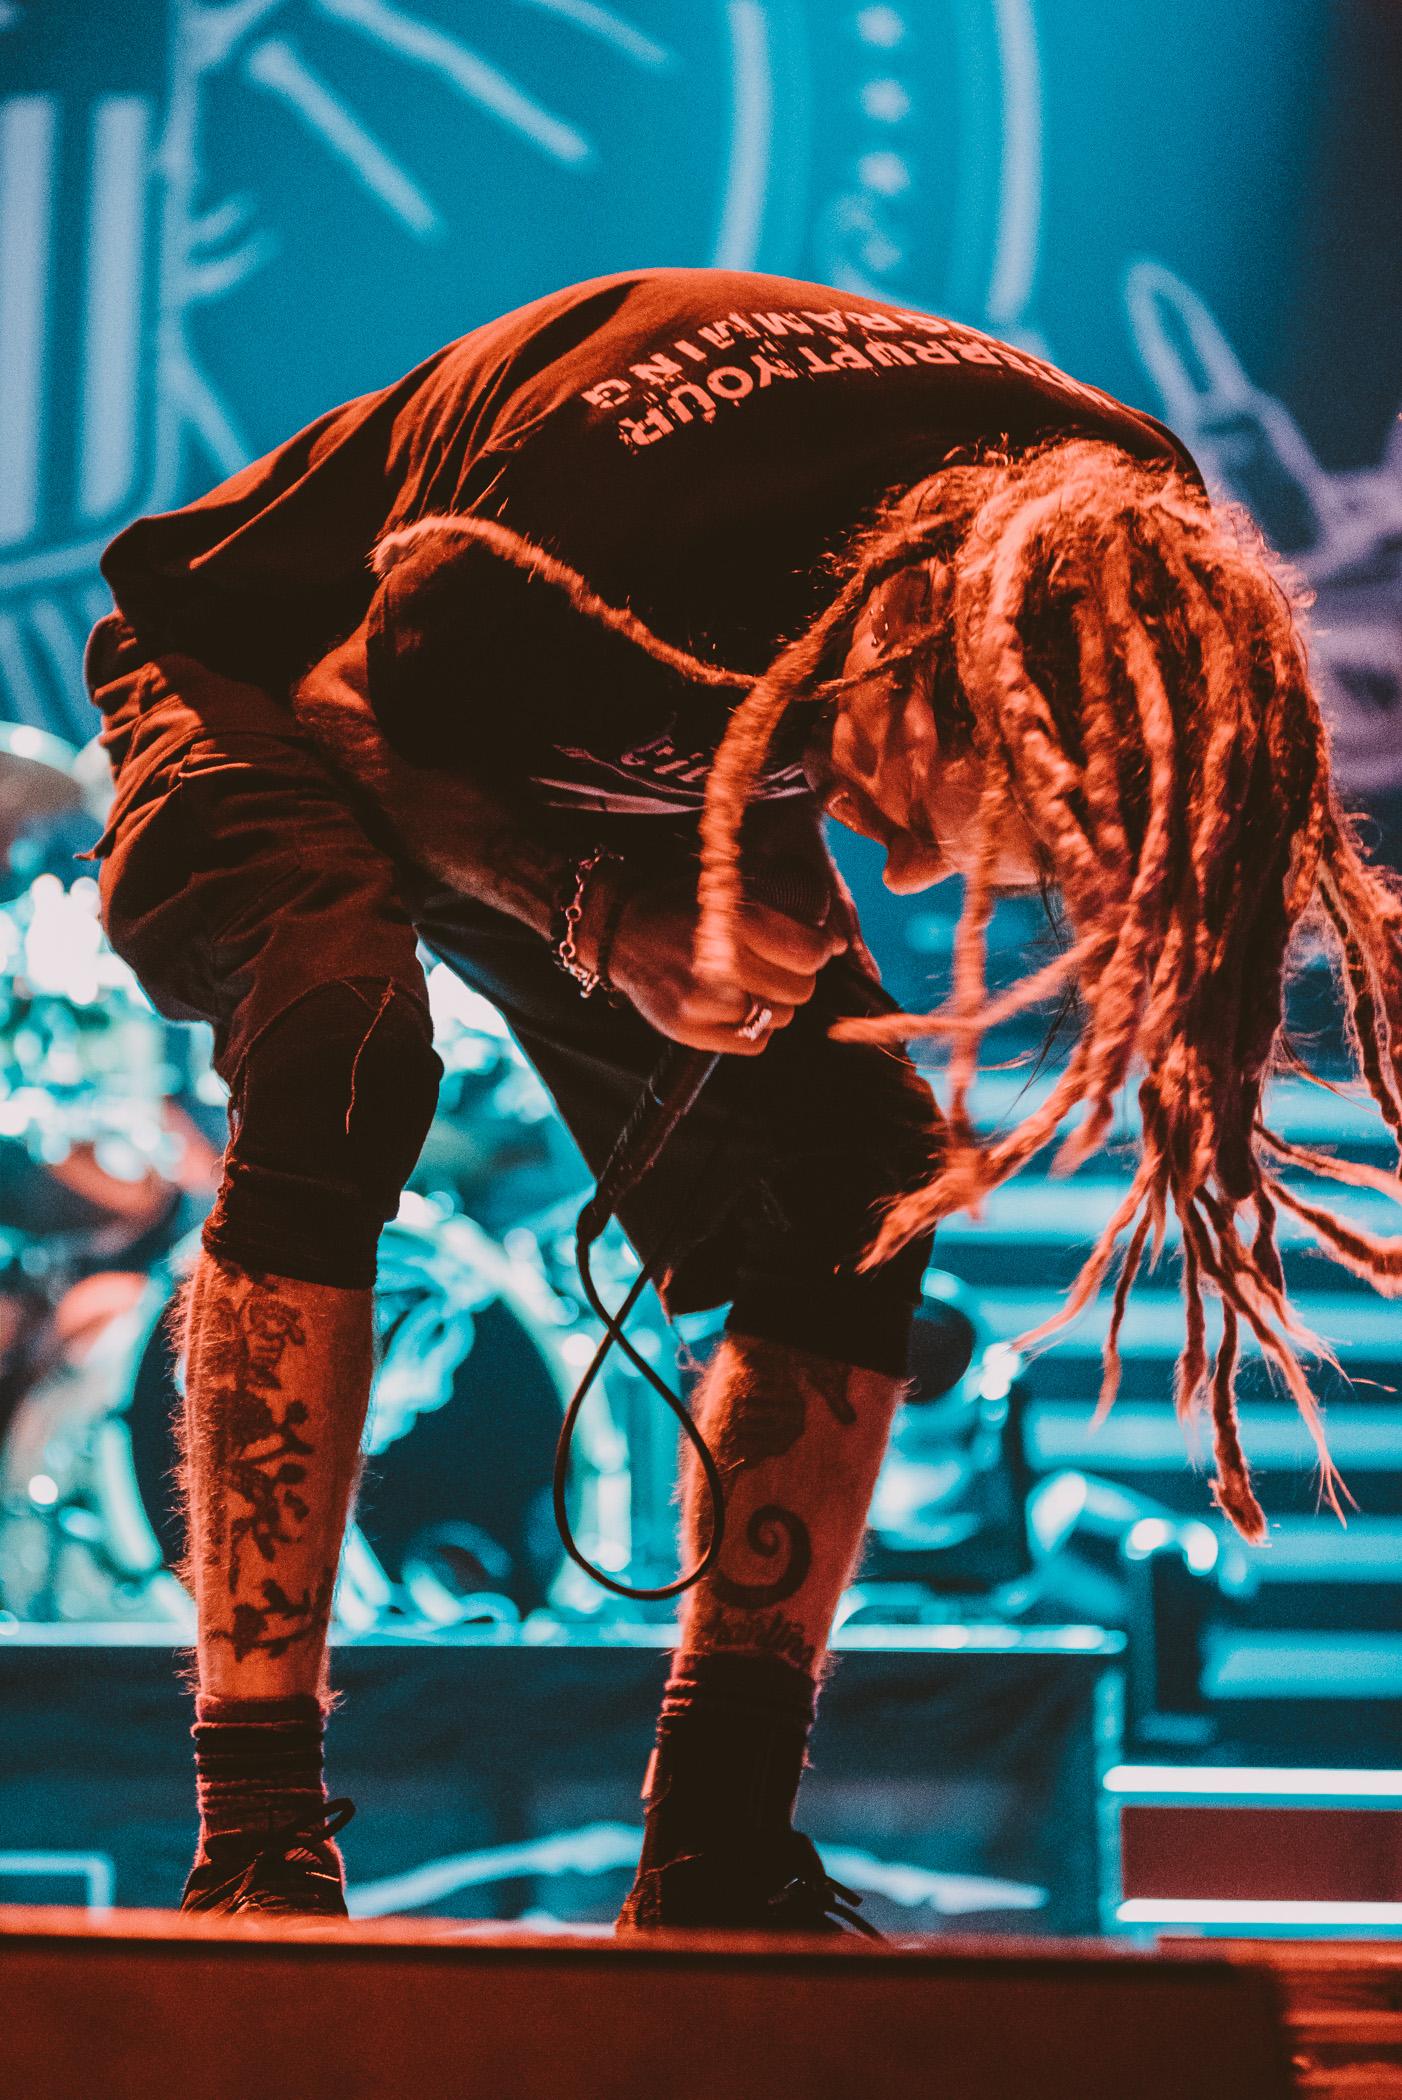 1_Lamb_Of_God-Pacific_Coliseum-Vancouver-Timothy_Nguyen-20180516 (13 of 47).jpg